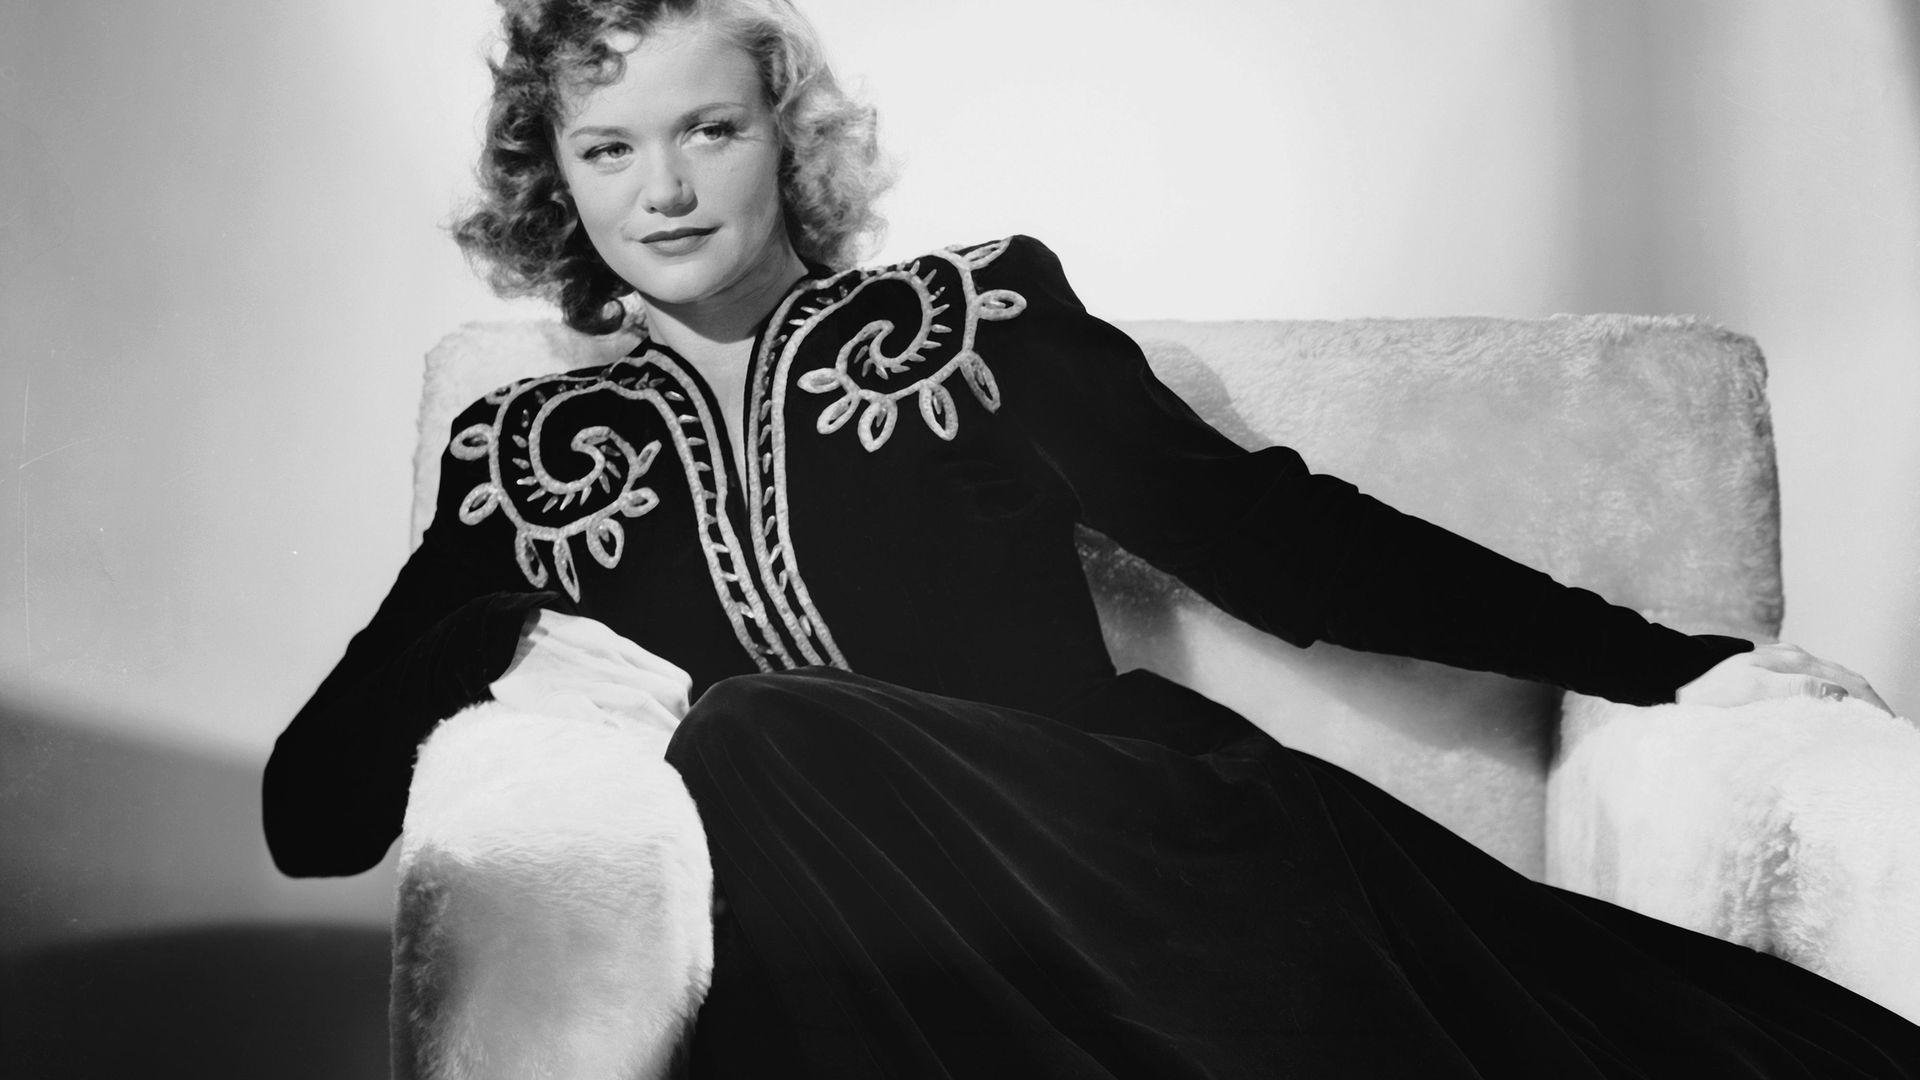 Actress Simone Simon, circa 1942 - Credit: Getty Images